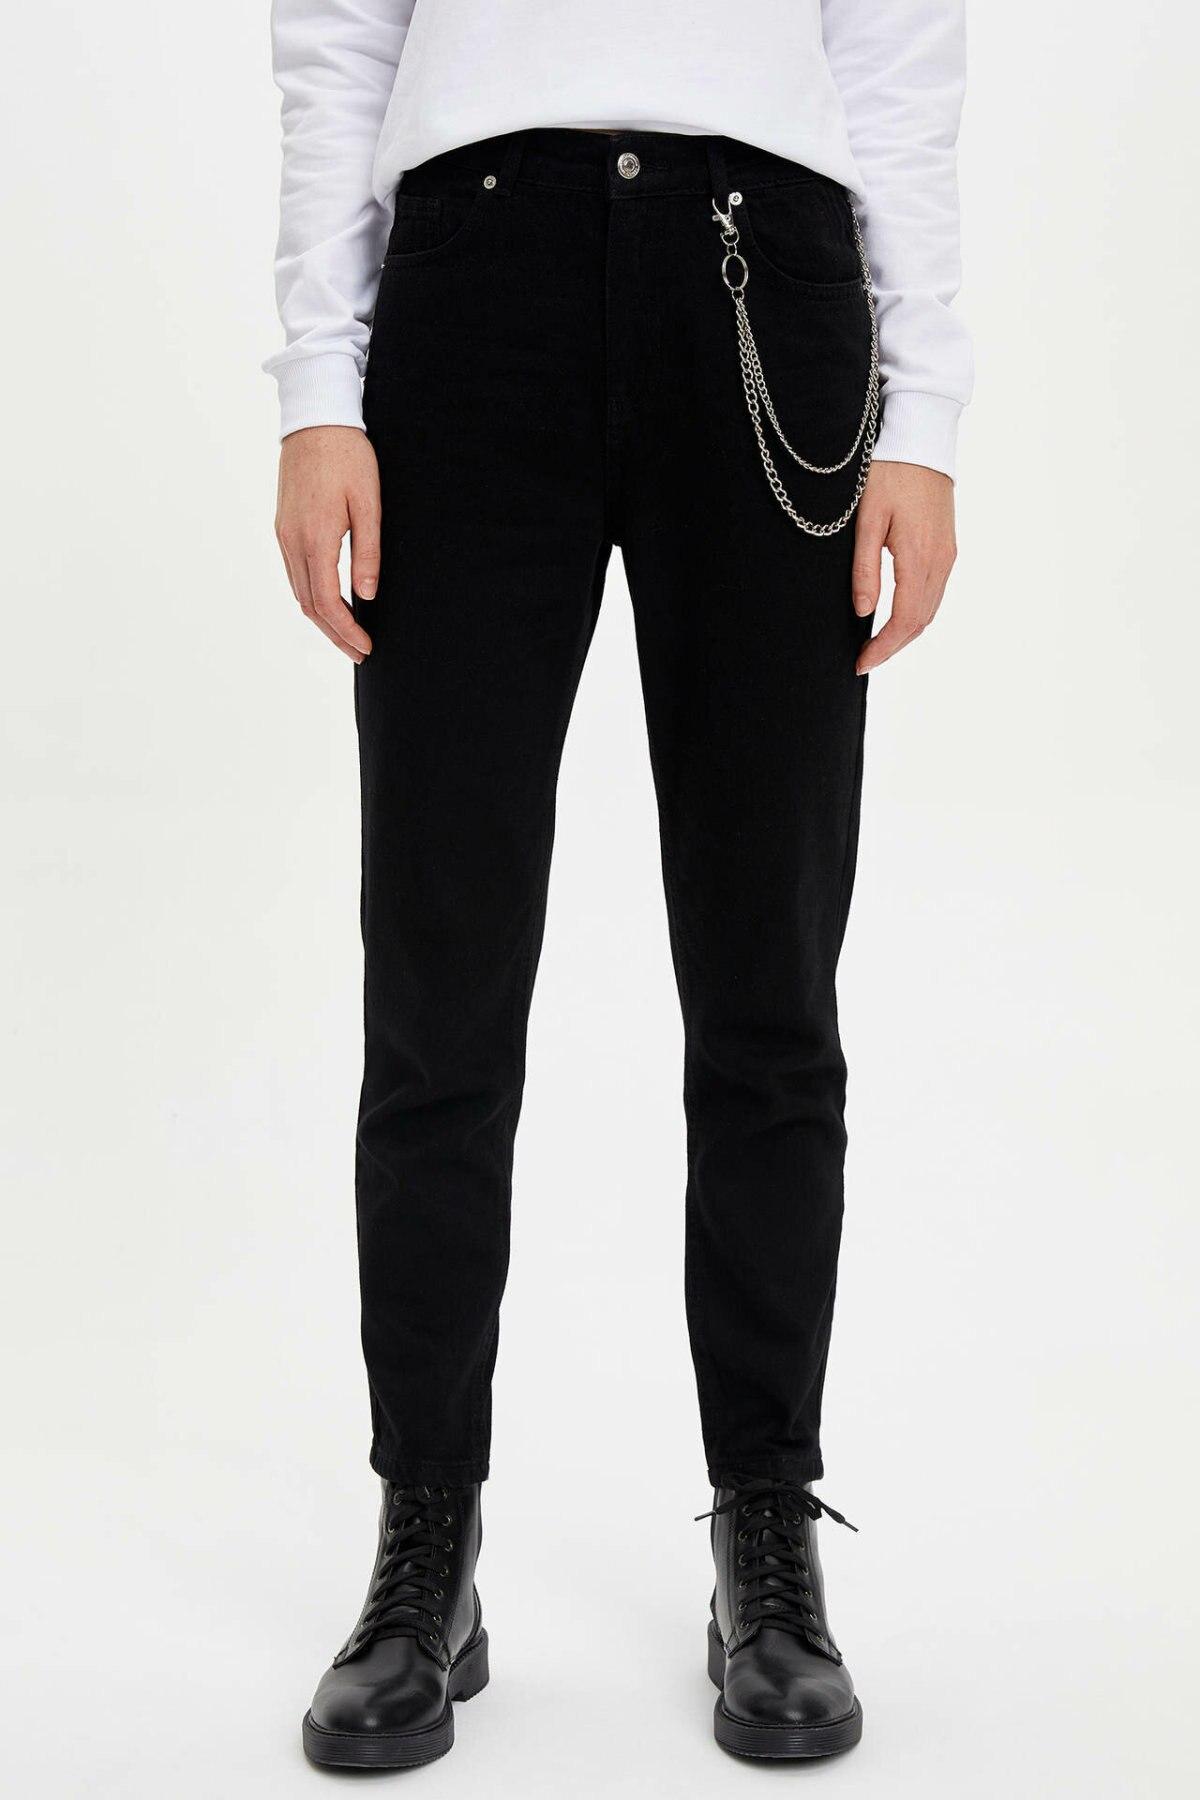 DeFacto Fashion Woman Black Trousers Casual Straight Loose Pants Mid Waist Leisure Breathable Chain Pants Female  - L6280AZ19AU